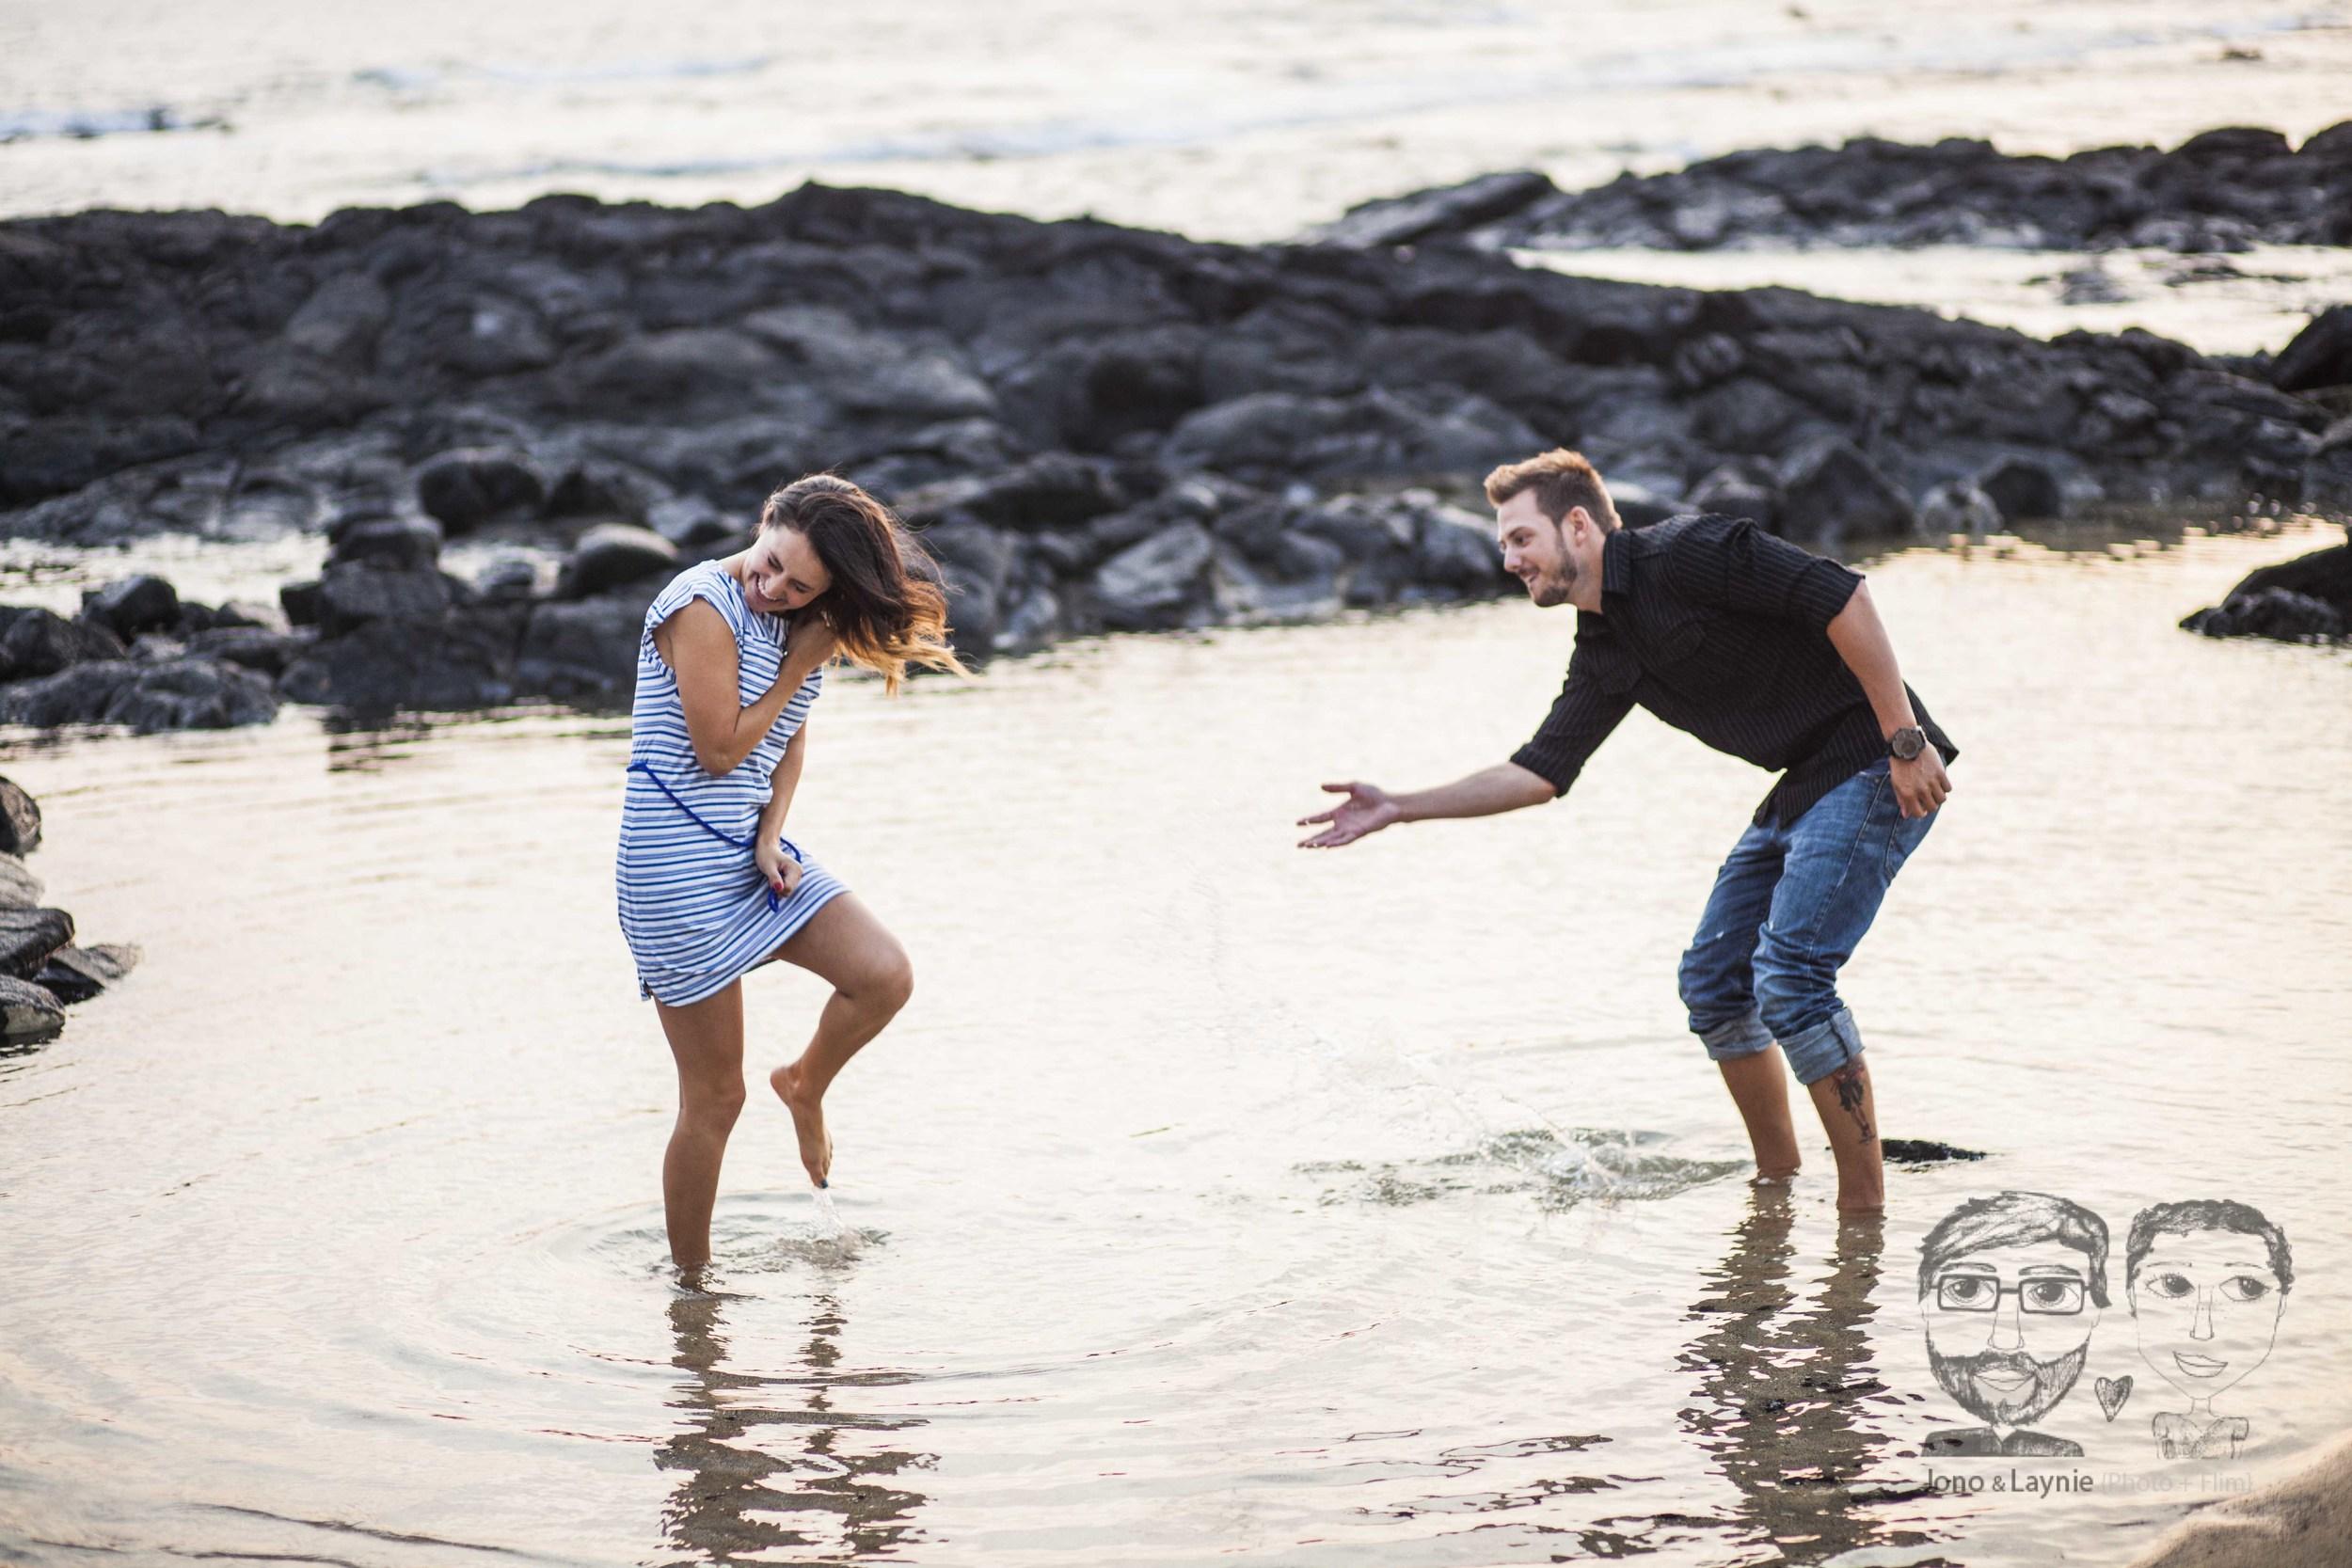 Jono & Laynie Co.-Kona, Hawaii-Engagement Session37.jpg